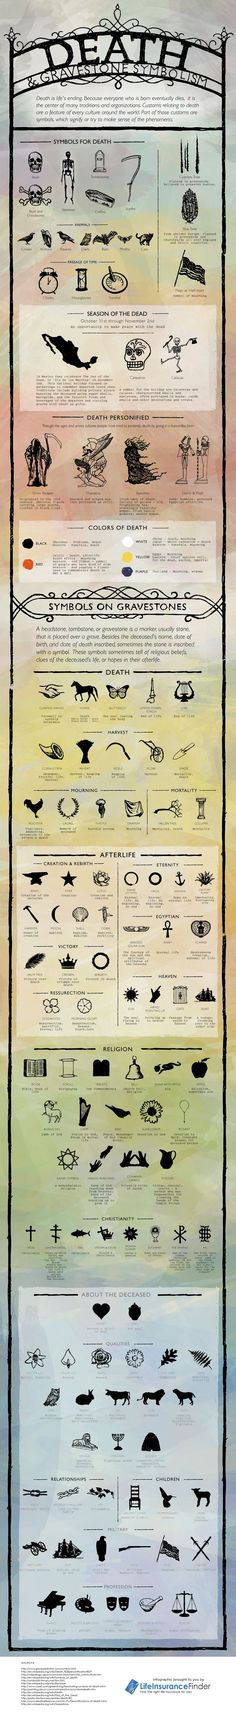 symbols in various cultures